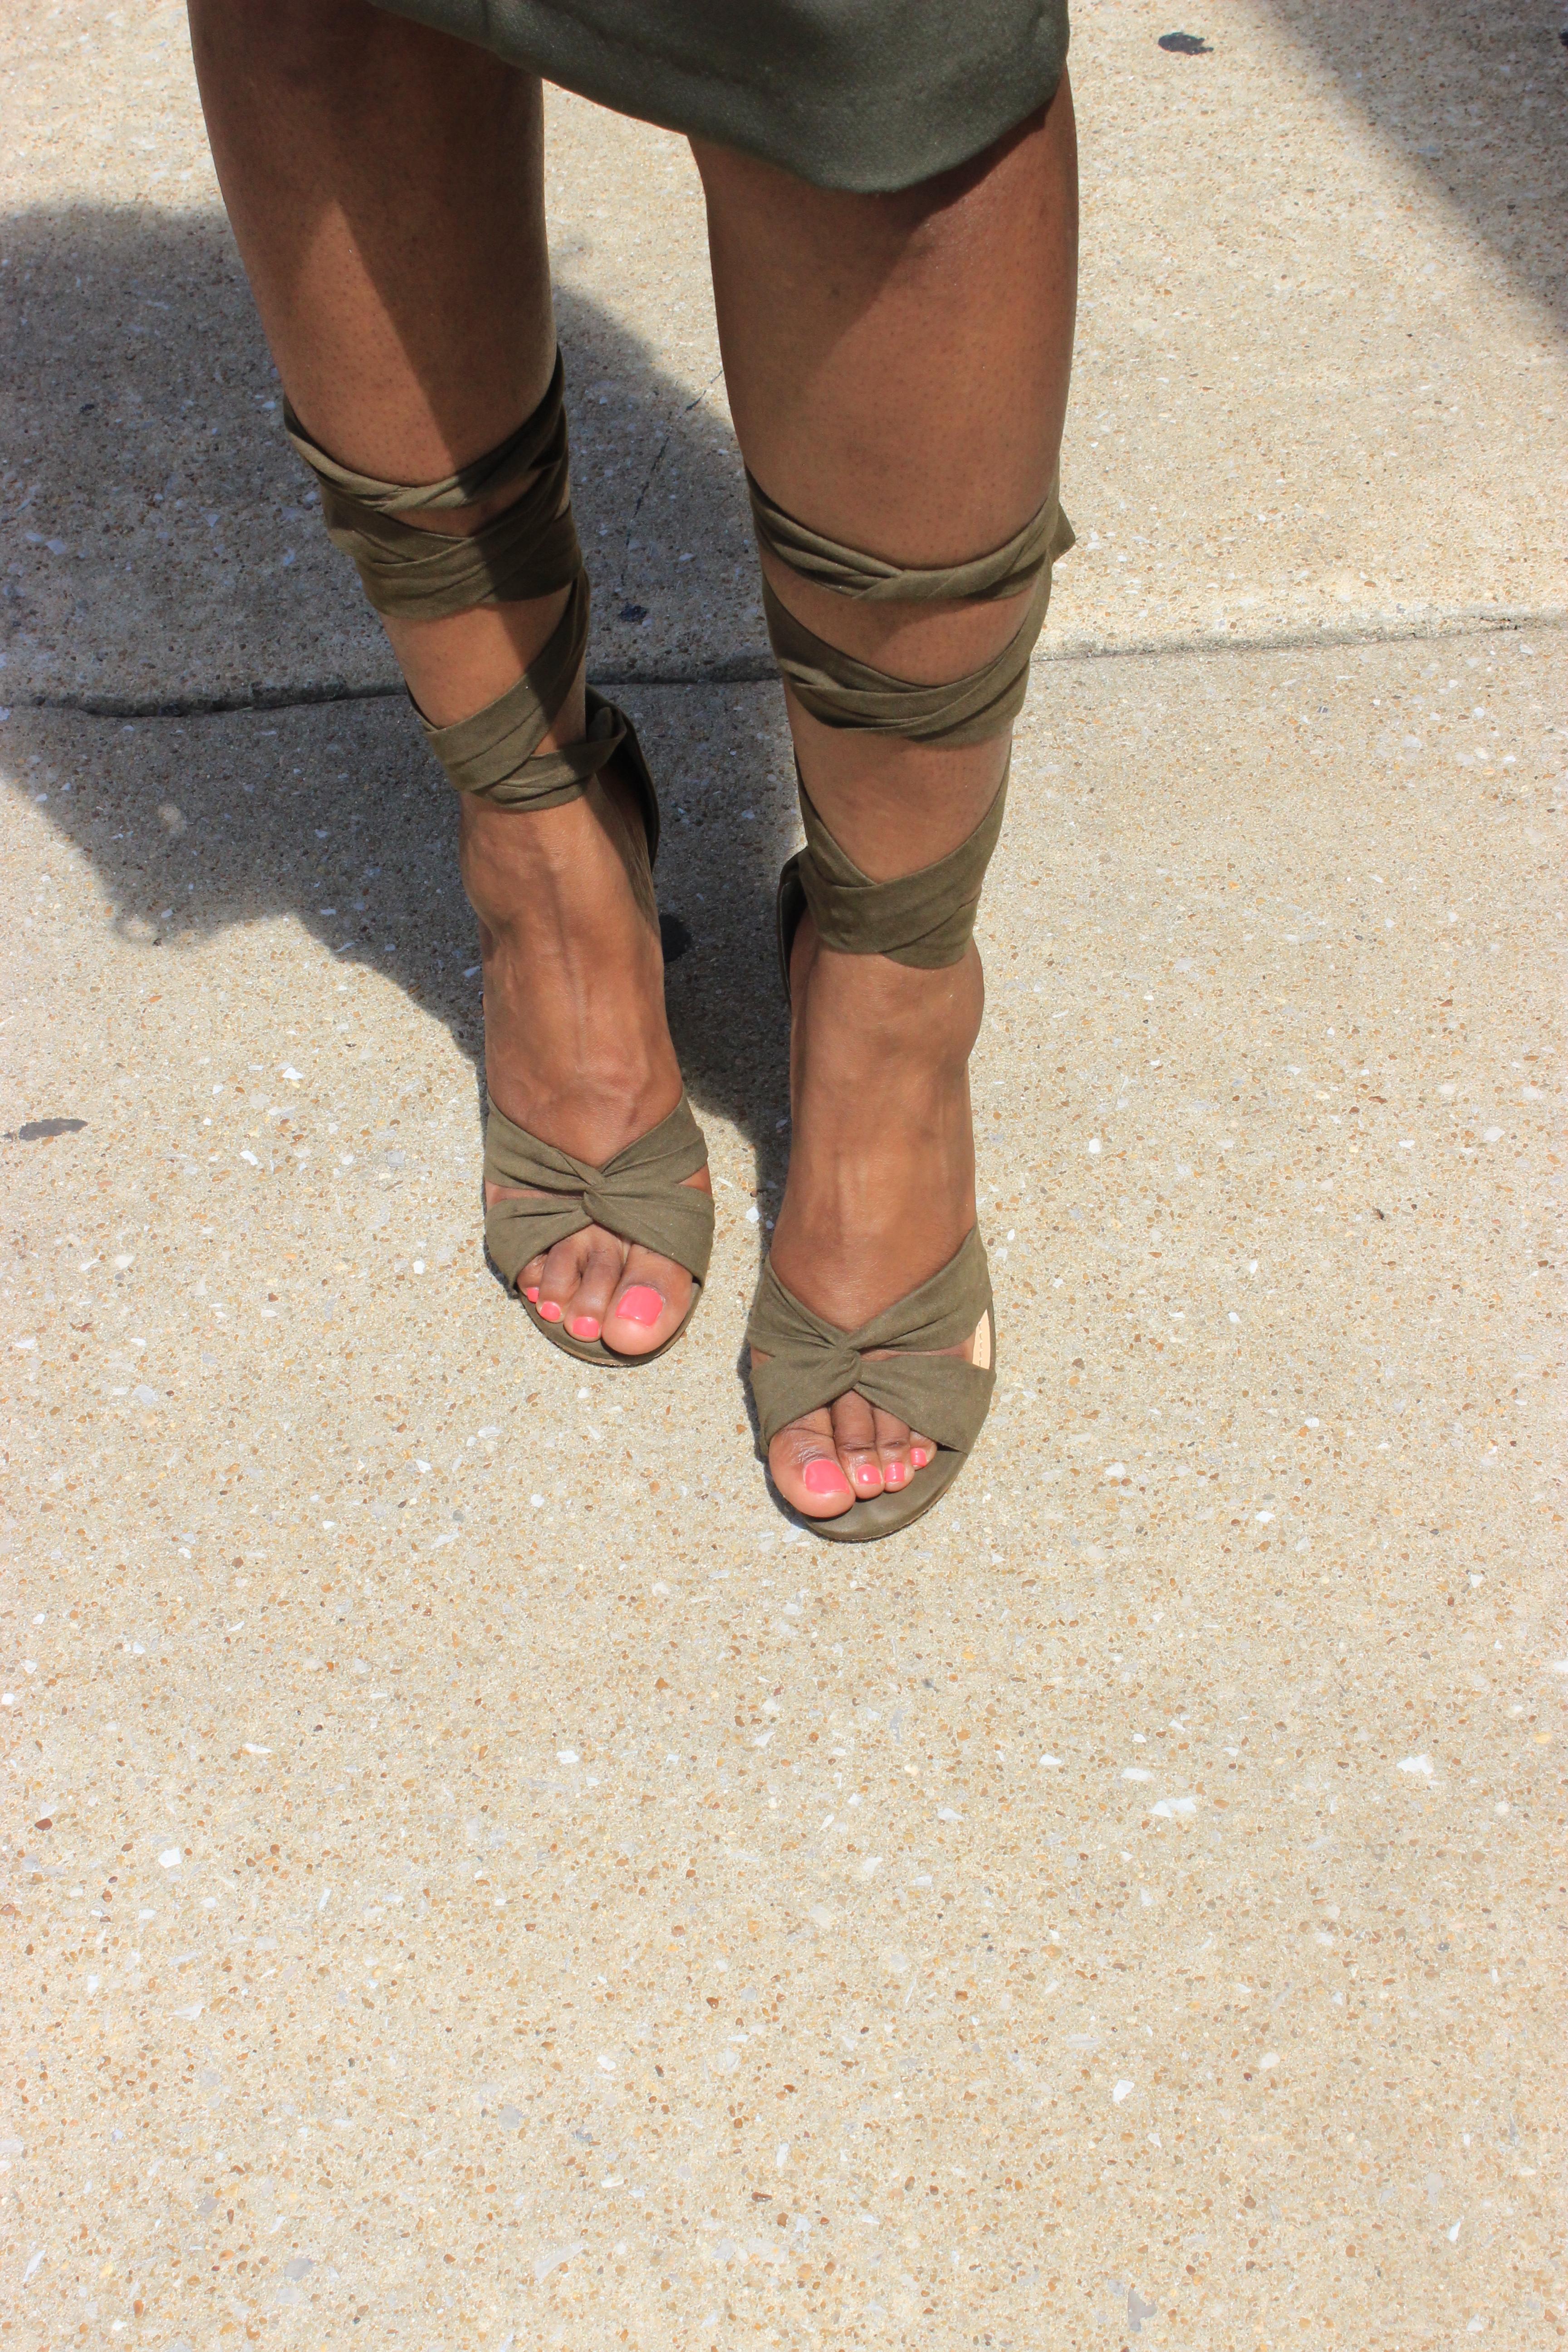 Style-Files-khaki-Vesper Cold-Shoulder-Pencil-Midi-Dress-JustFab-Acacia-Heeled-Sandals-Olive-Green-how to-wear-olive-green-how-to-wear-khaki-oohlalablog-13